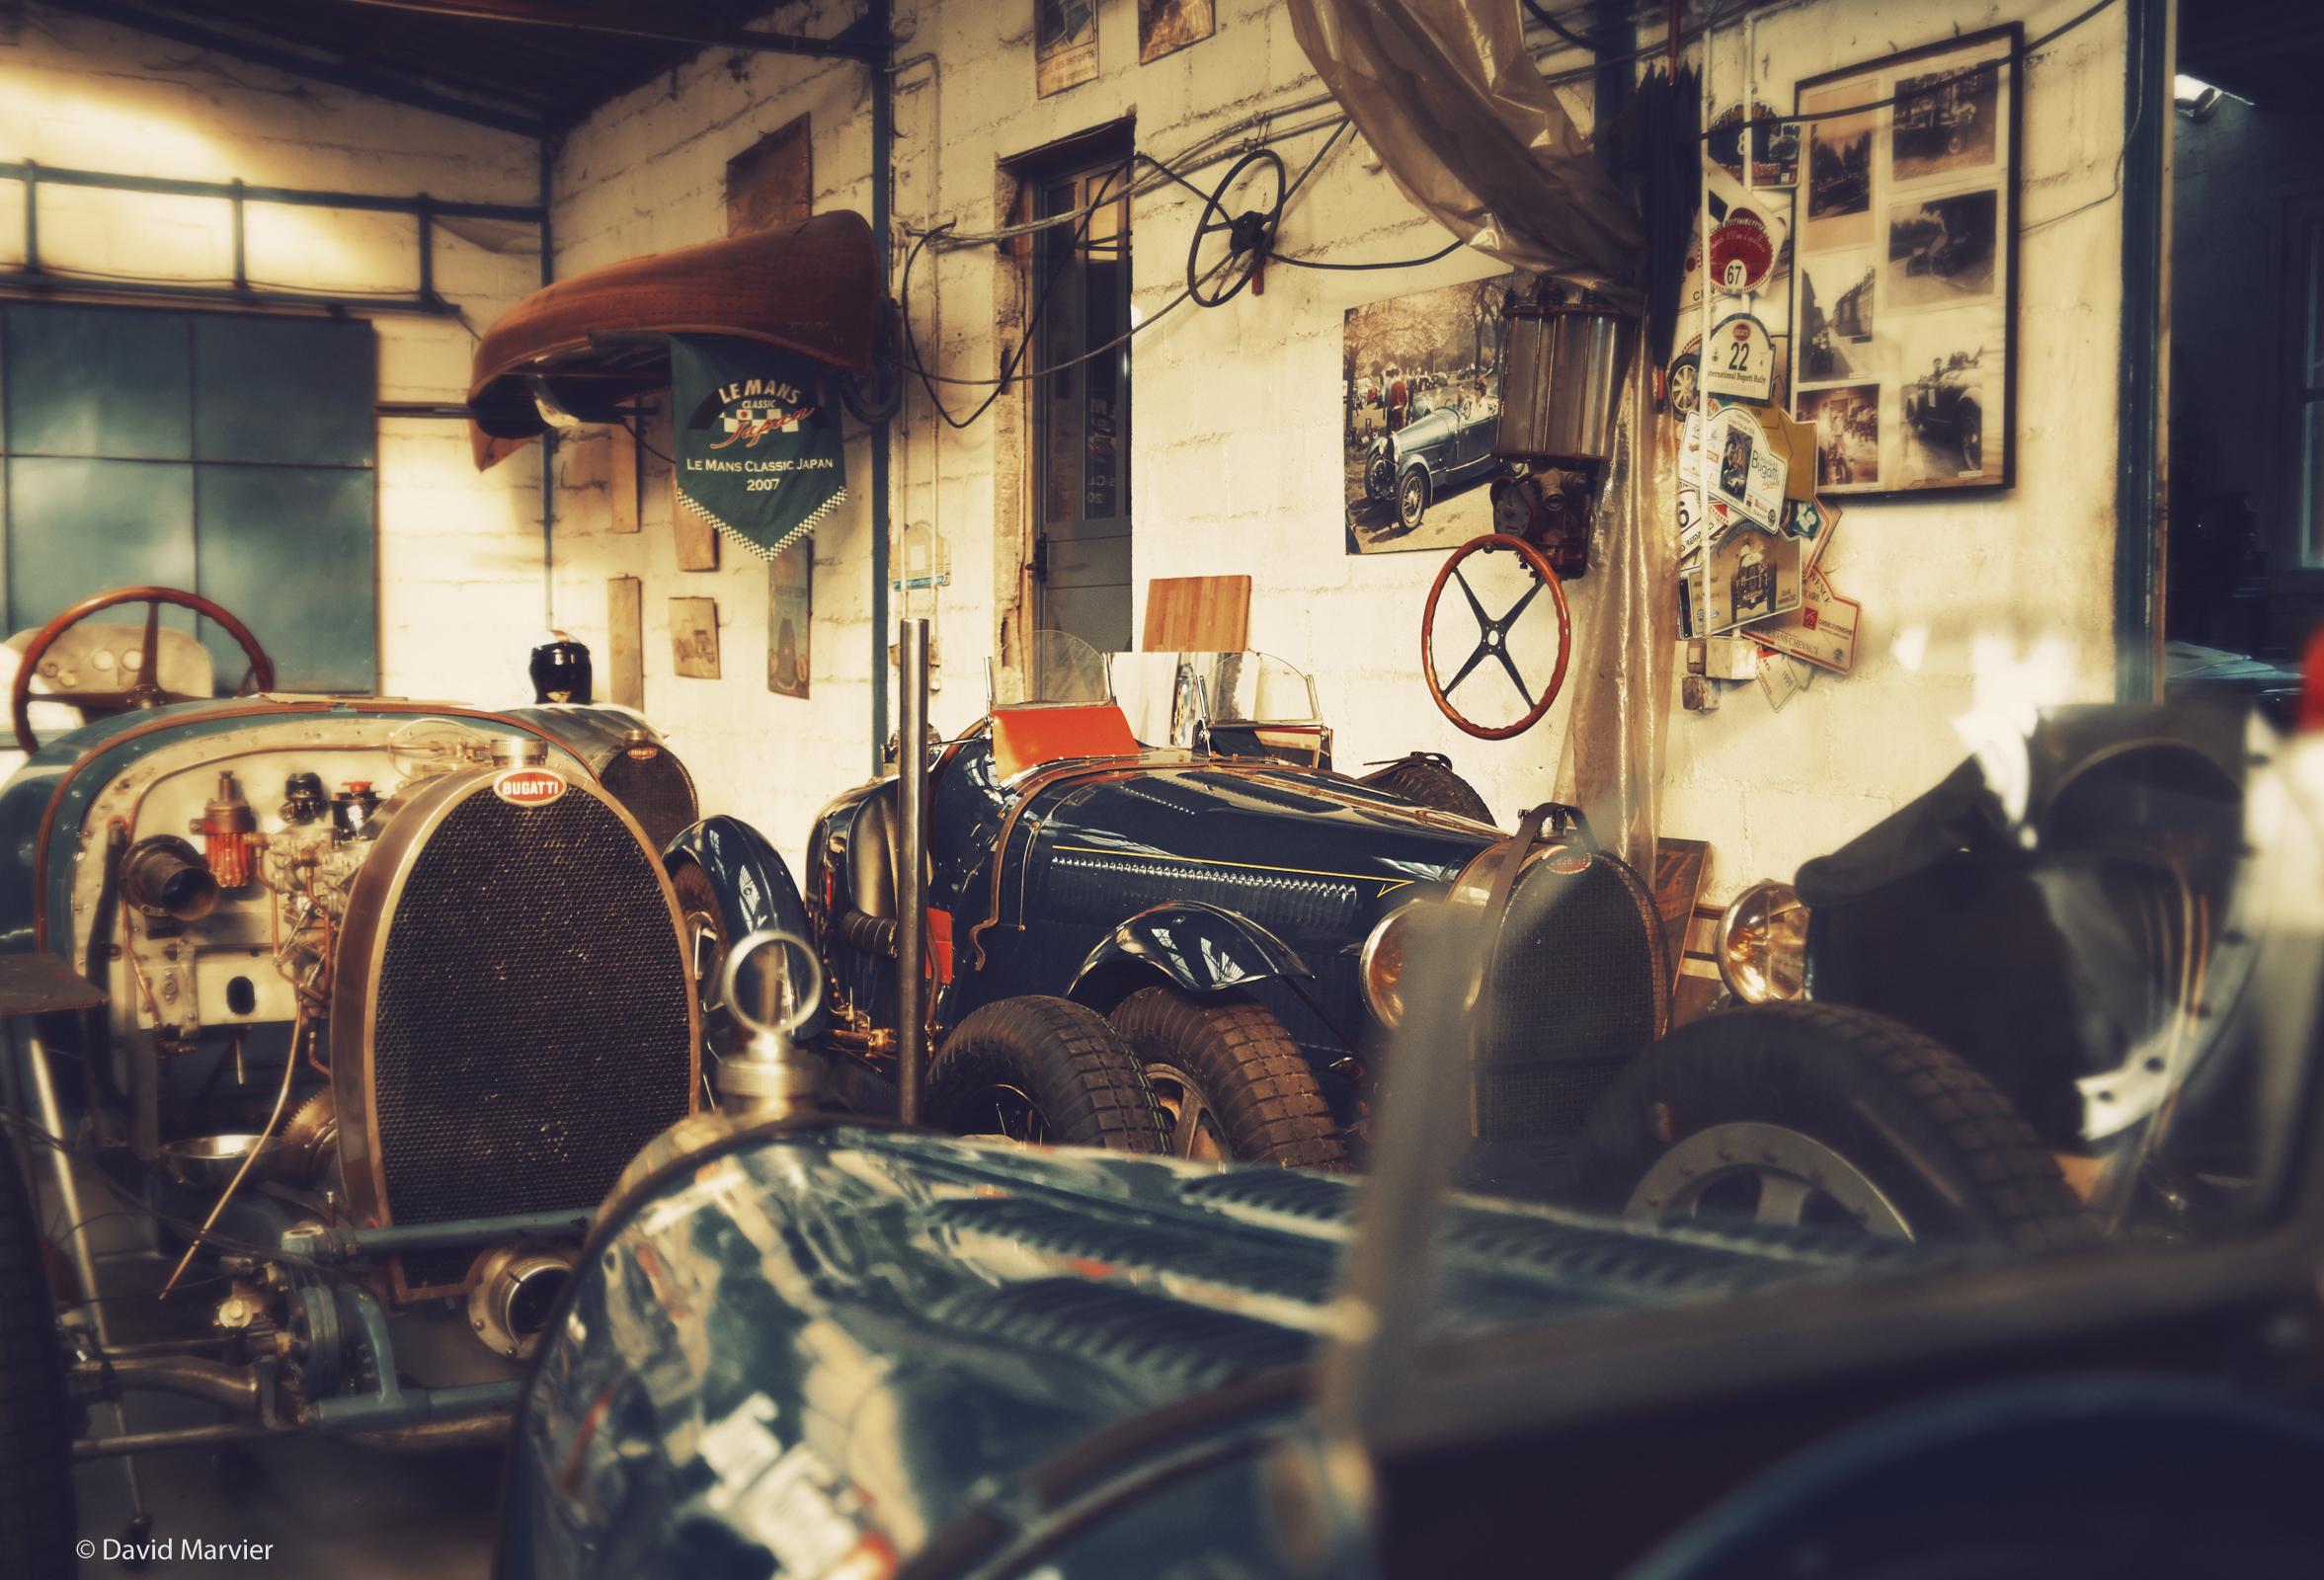 BUGATTI-WORKSHOP-6_©_David_Marvier.jpg